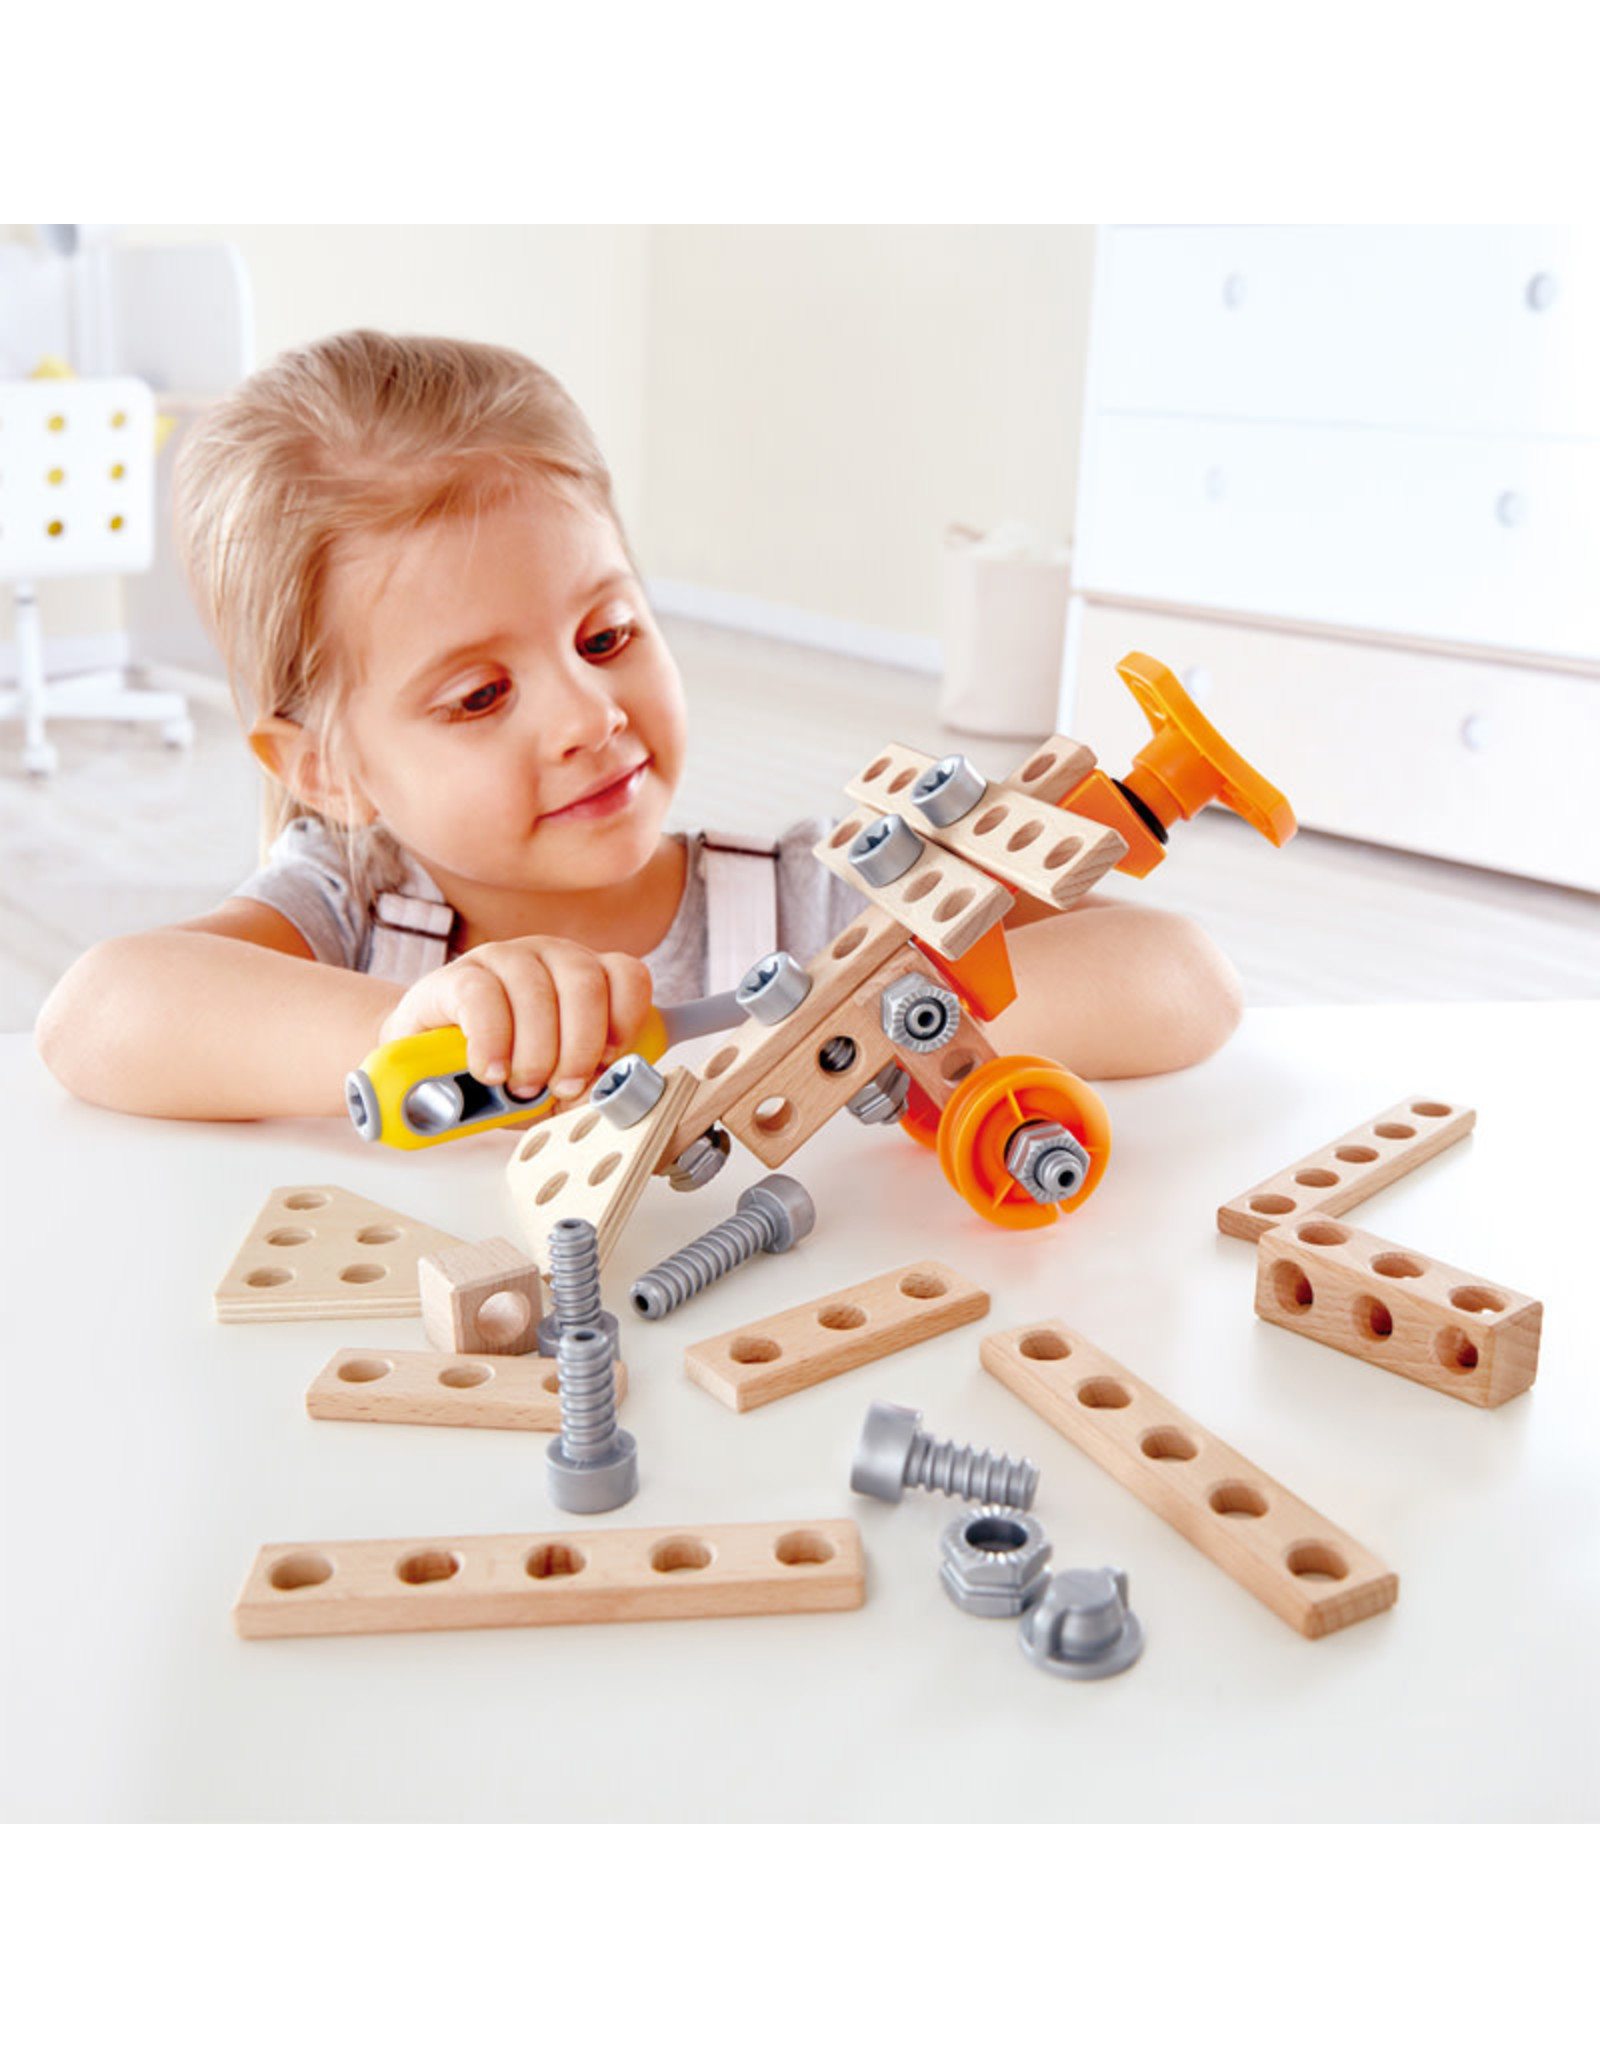 Hape Experiment Starter Kit Junior Inventor